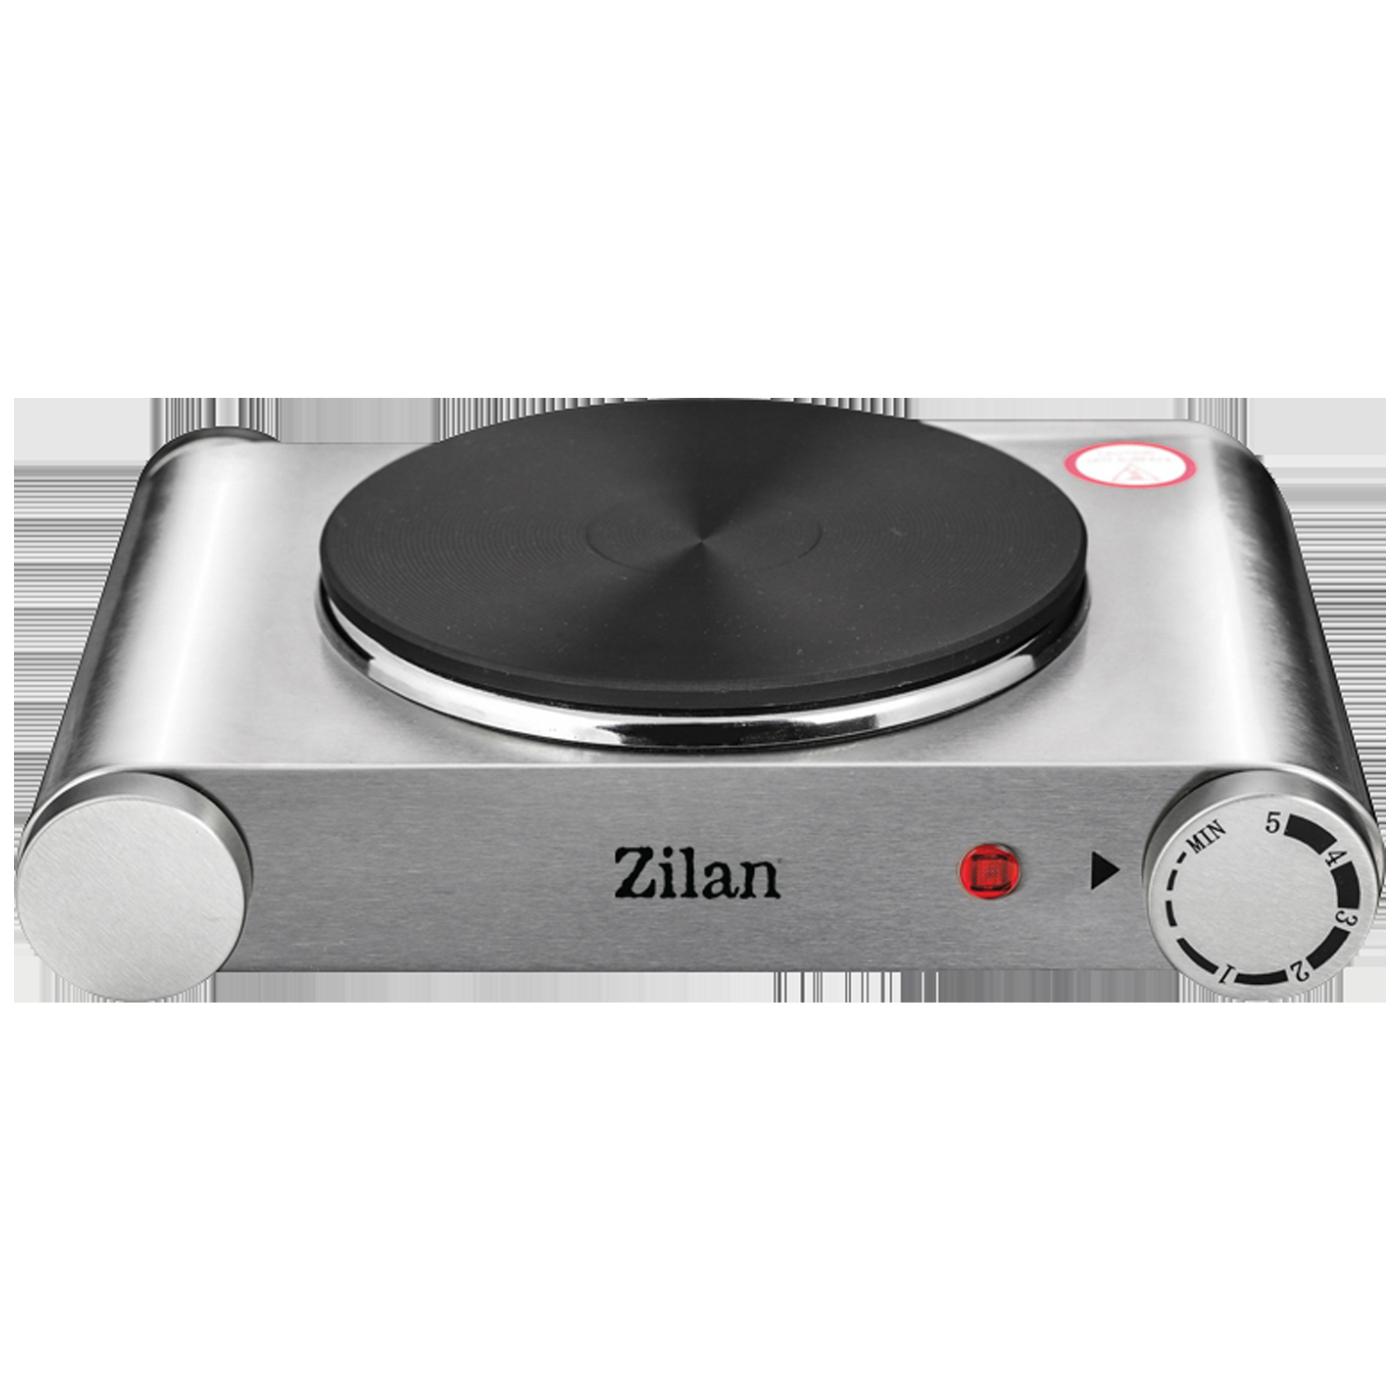 Zilan - ZLN0535